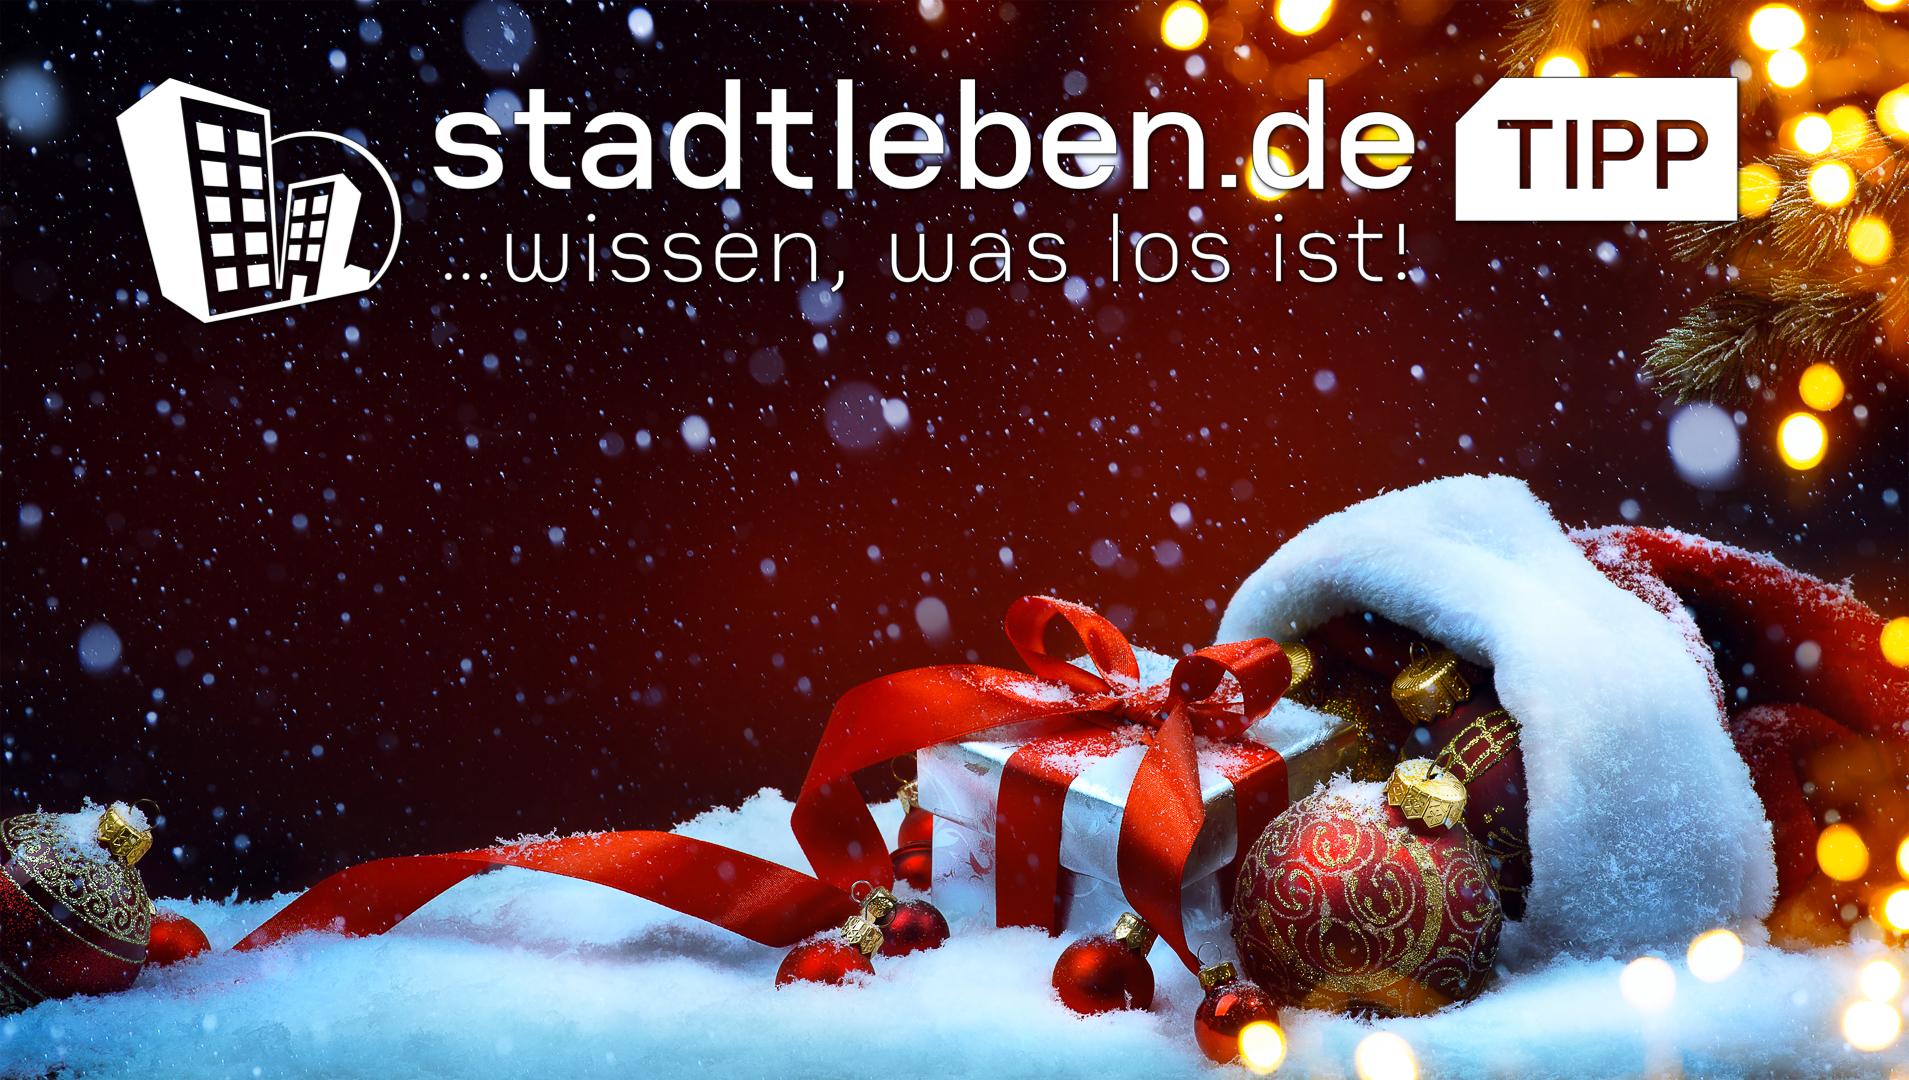 Geschenke, Weihnachten, geschmückt, Schnee